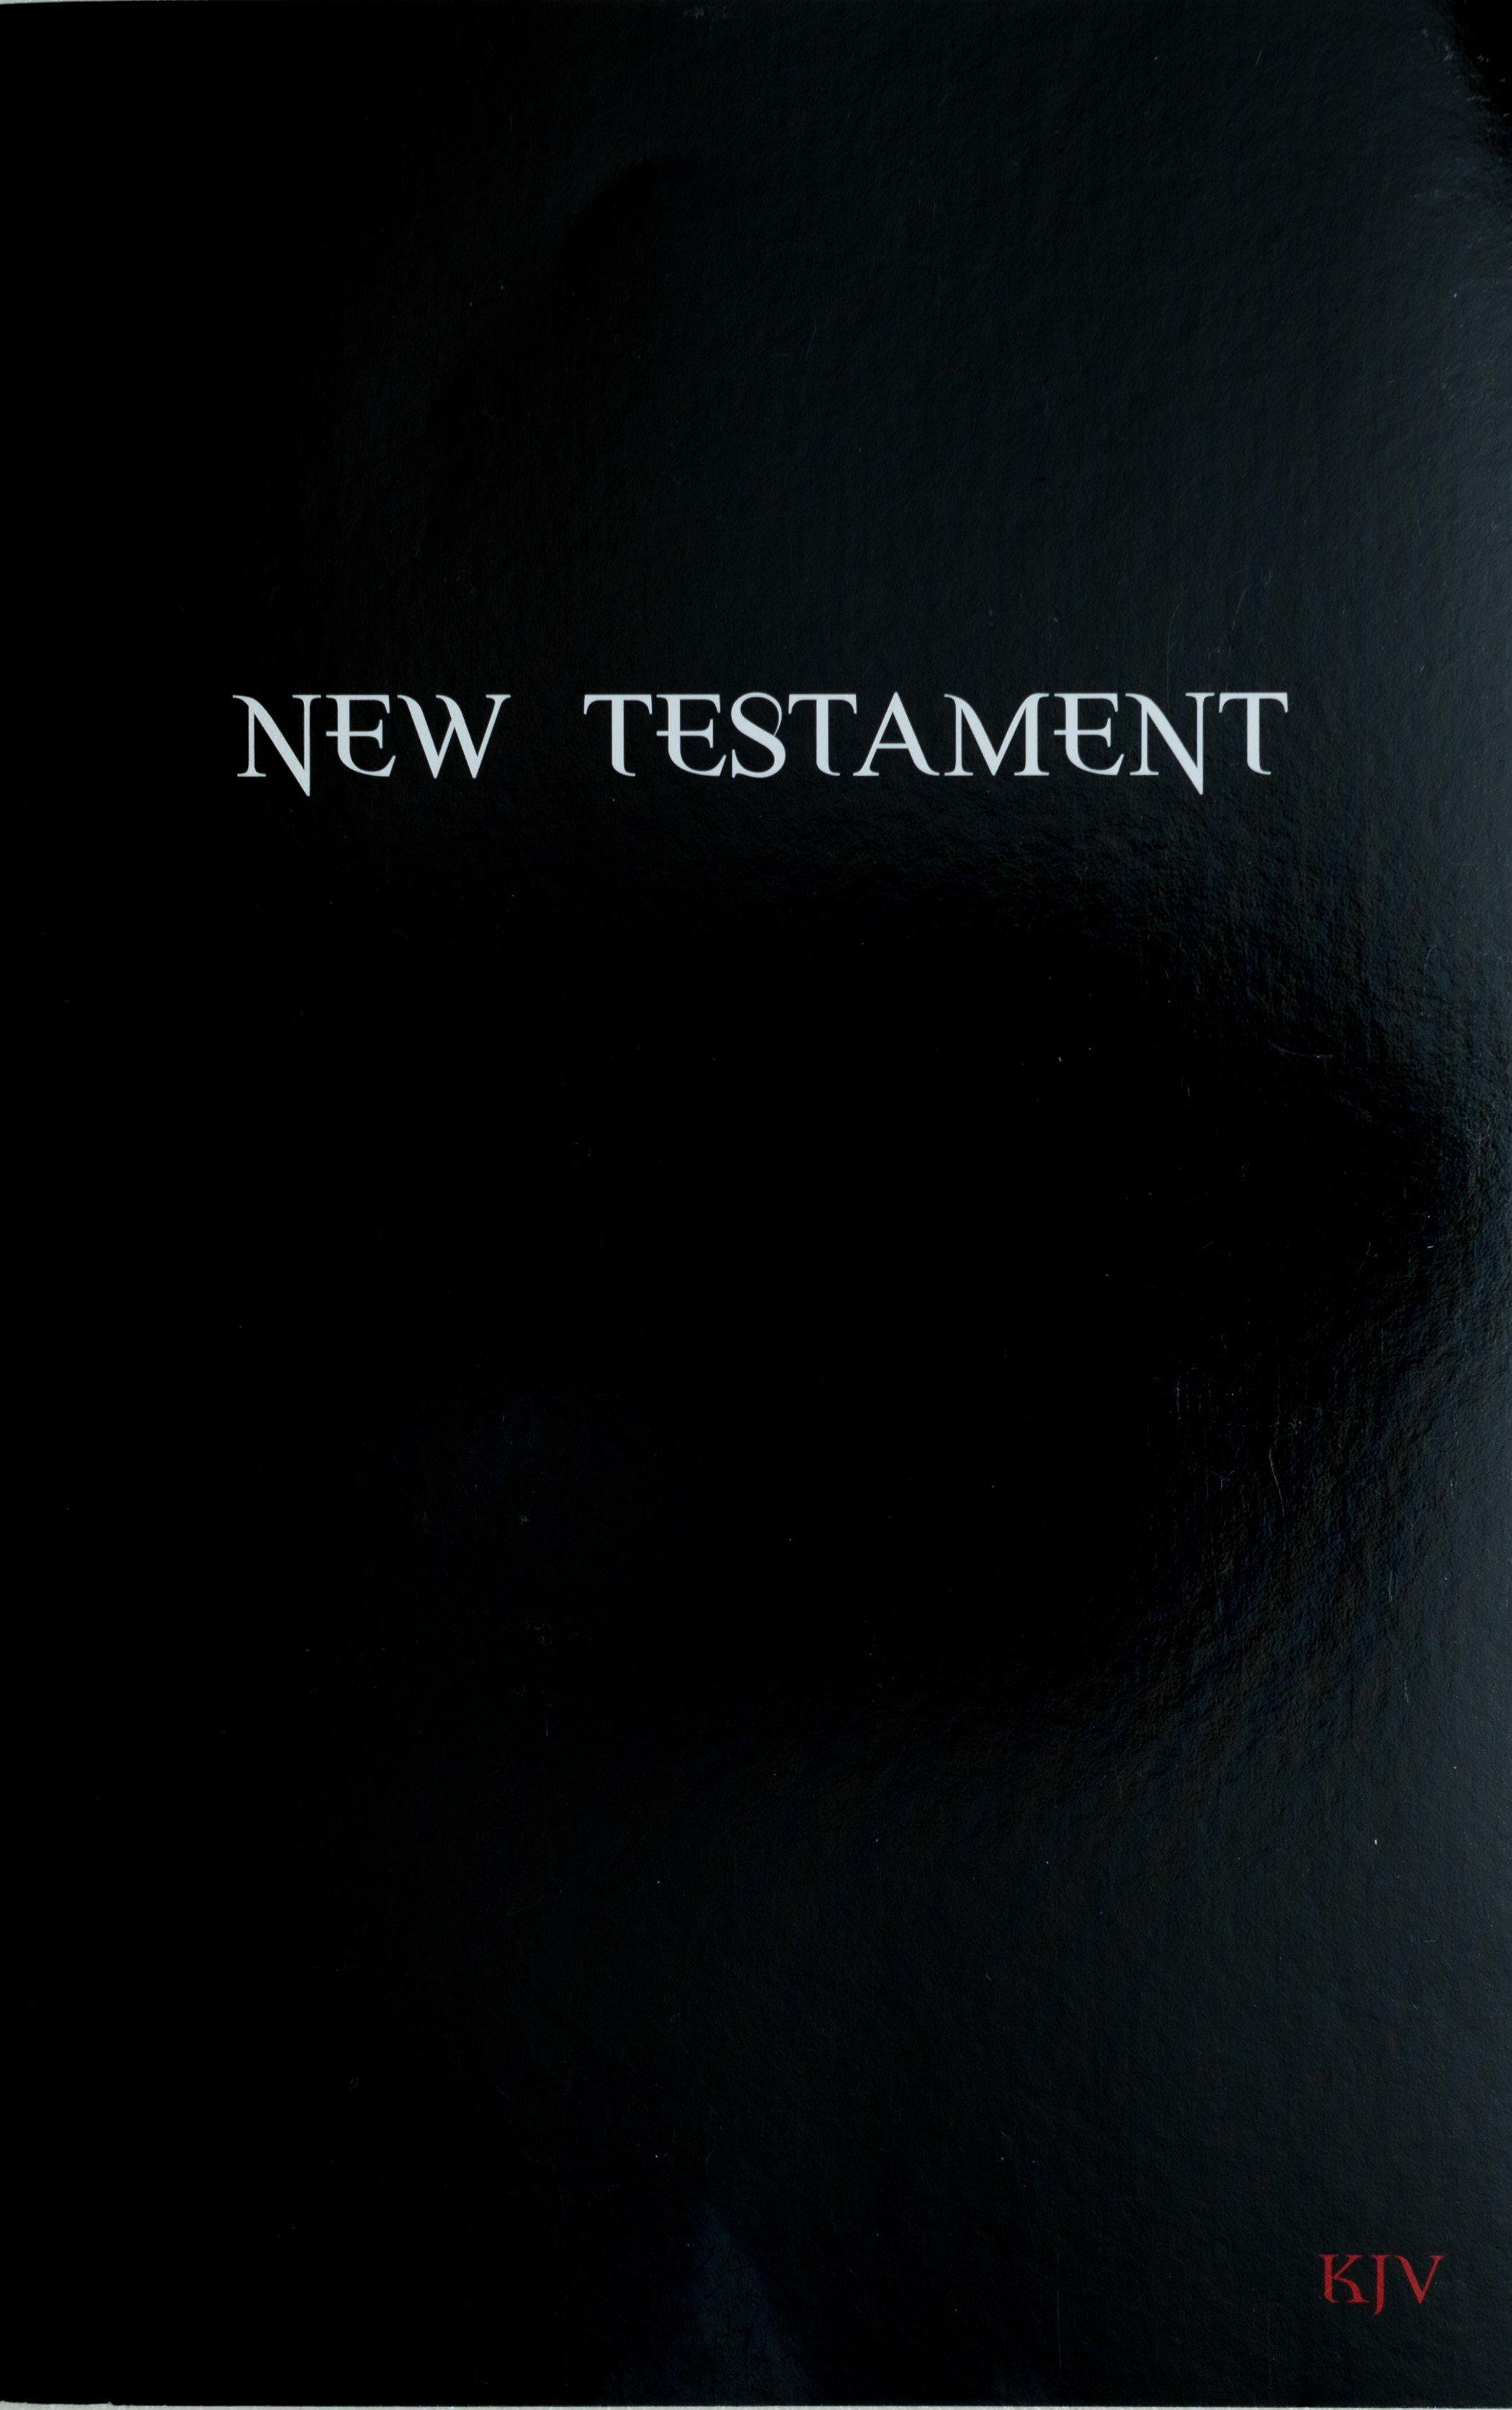 New Testament KJV      OUT OF STOCK